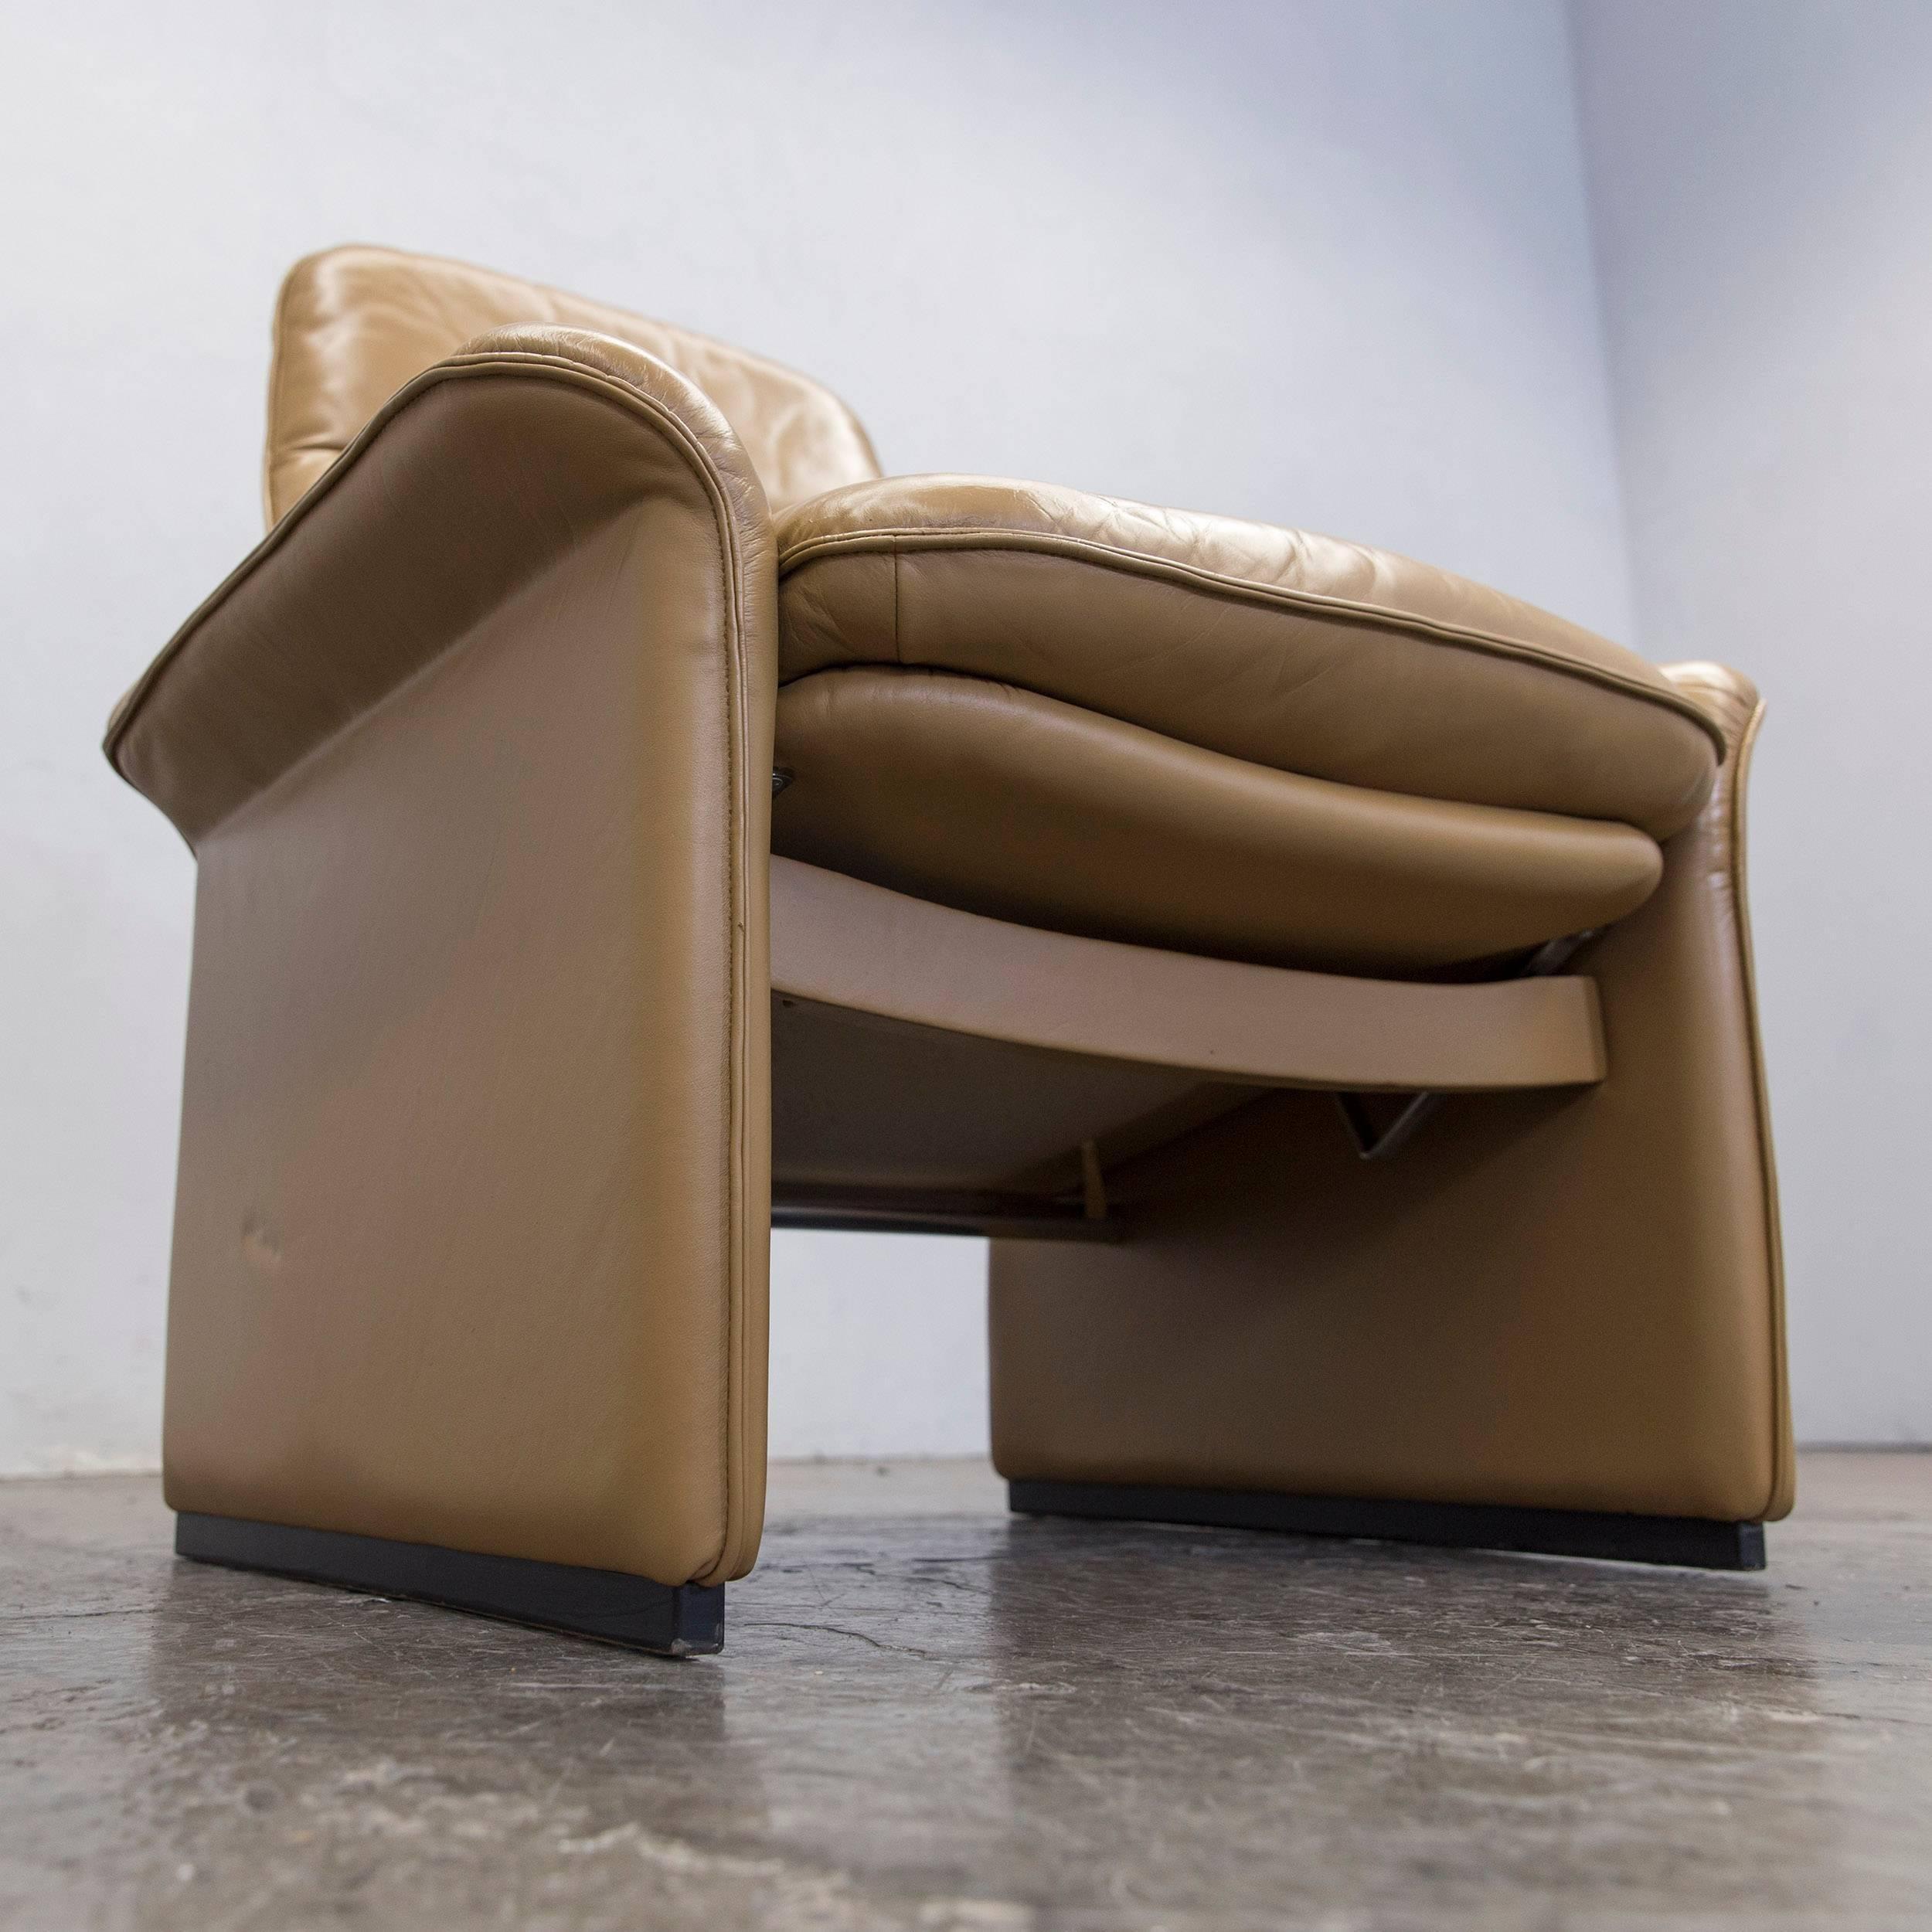 Swiss De Sede DS 50 Leather Relax Chair Ochre Modern For Sale